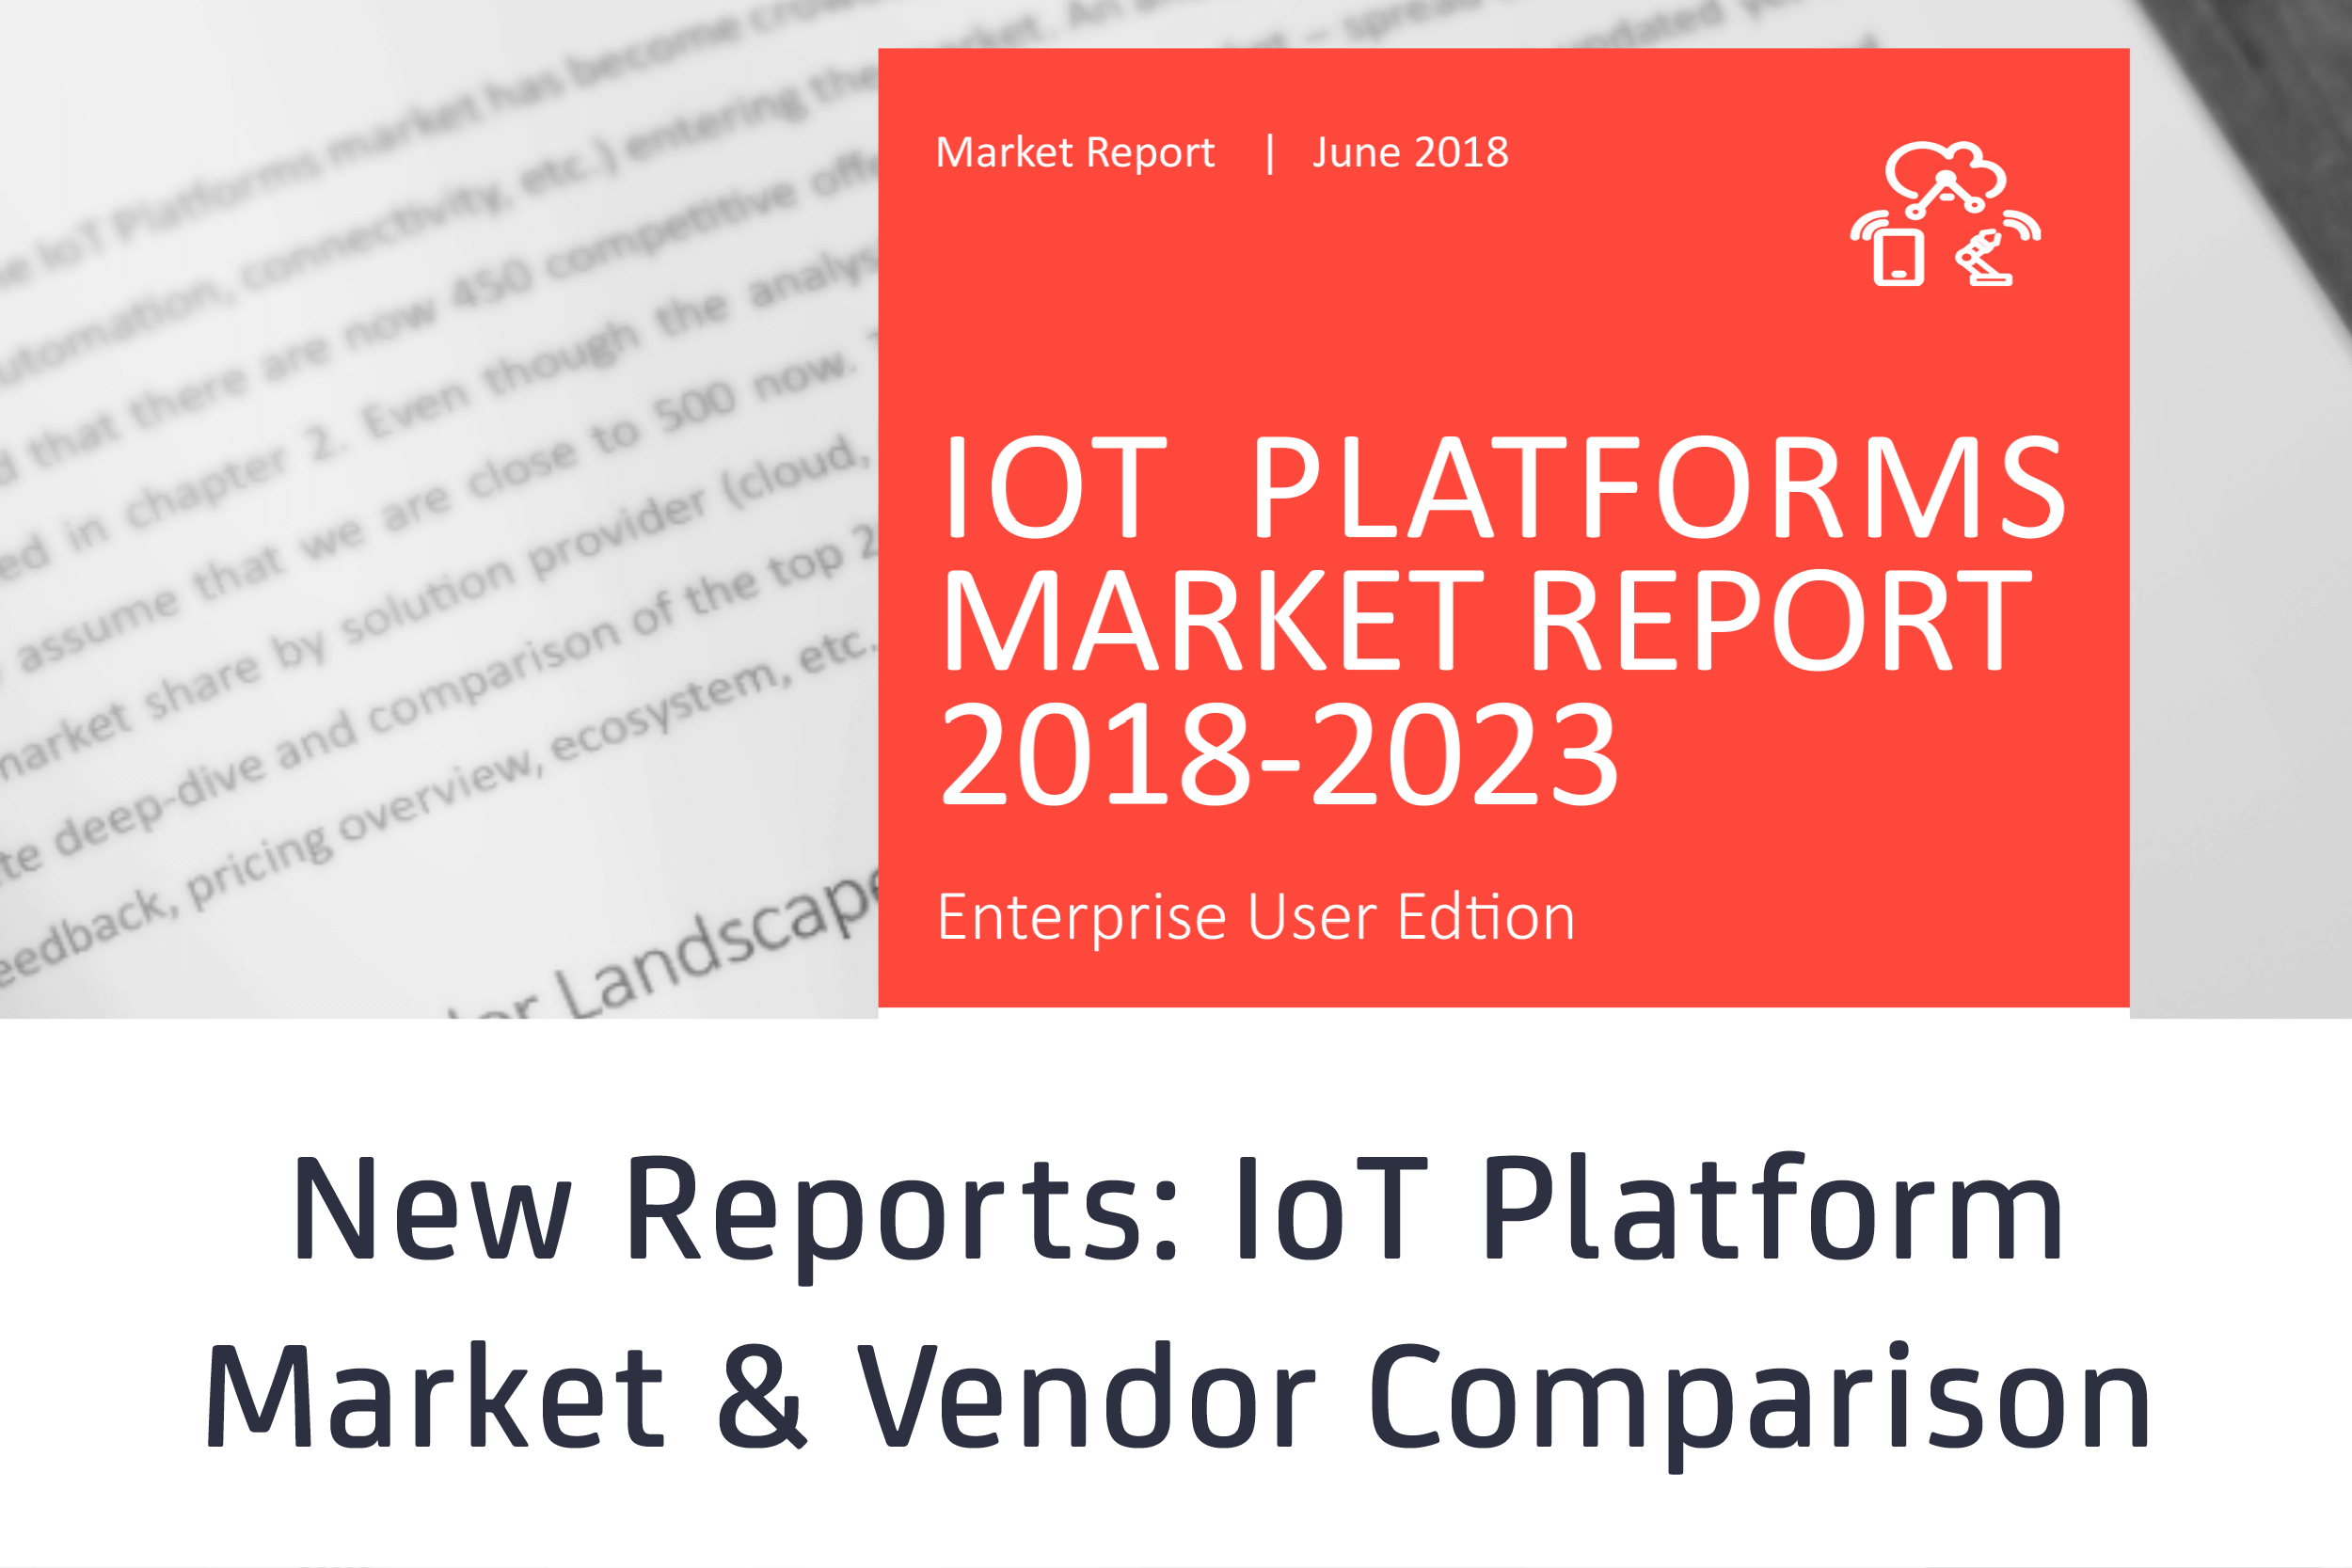 Microsoft & PTC named leading IoT Platform vendors as market growth